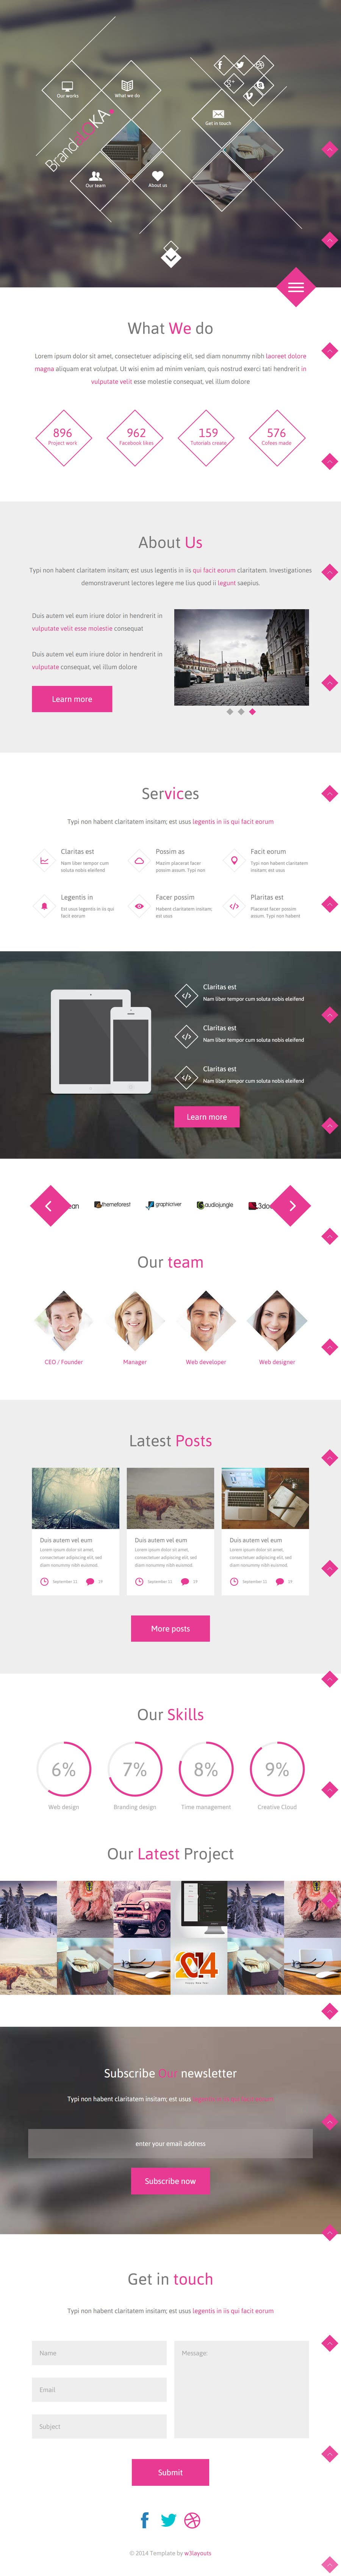 Kilpailutyö #8 kilpailussa Landing page design for marketing agency